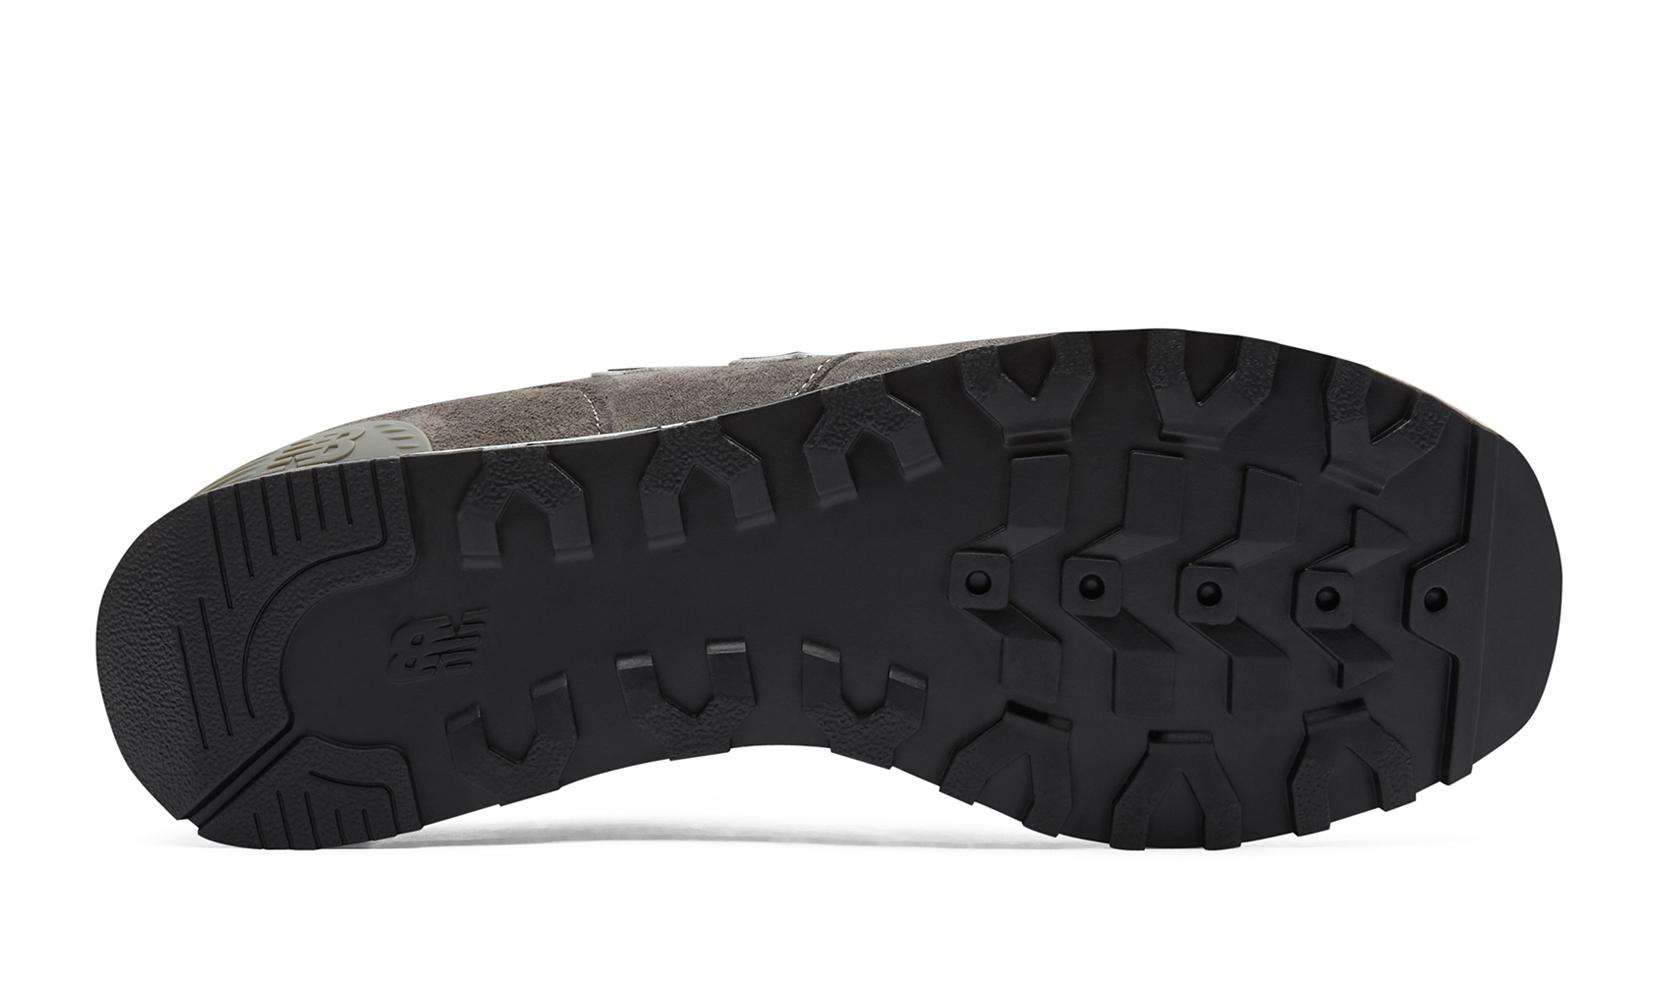 Чоловіче взуття повсякденне New Balance 576 Made in UK M576PMG | New Balance